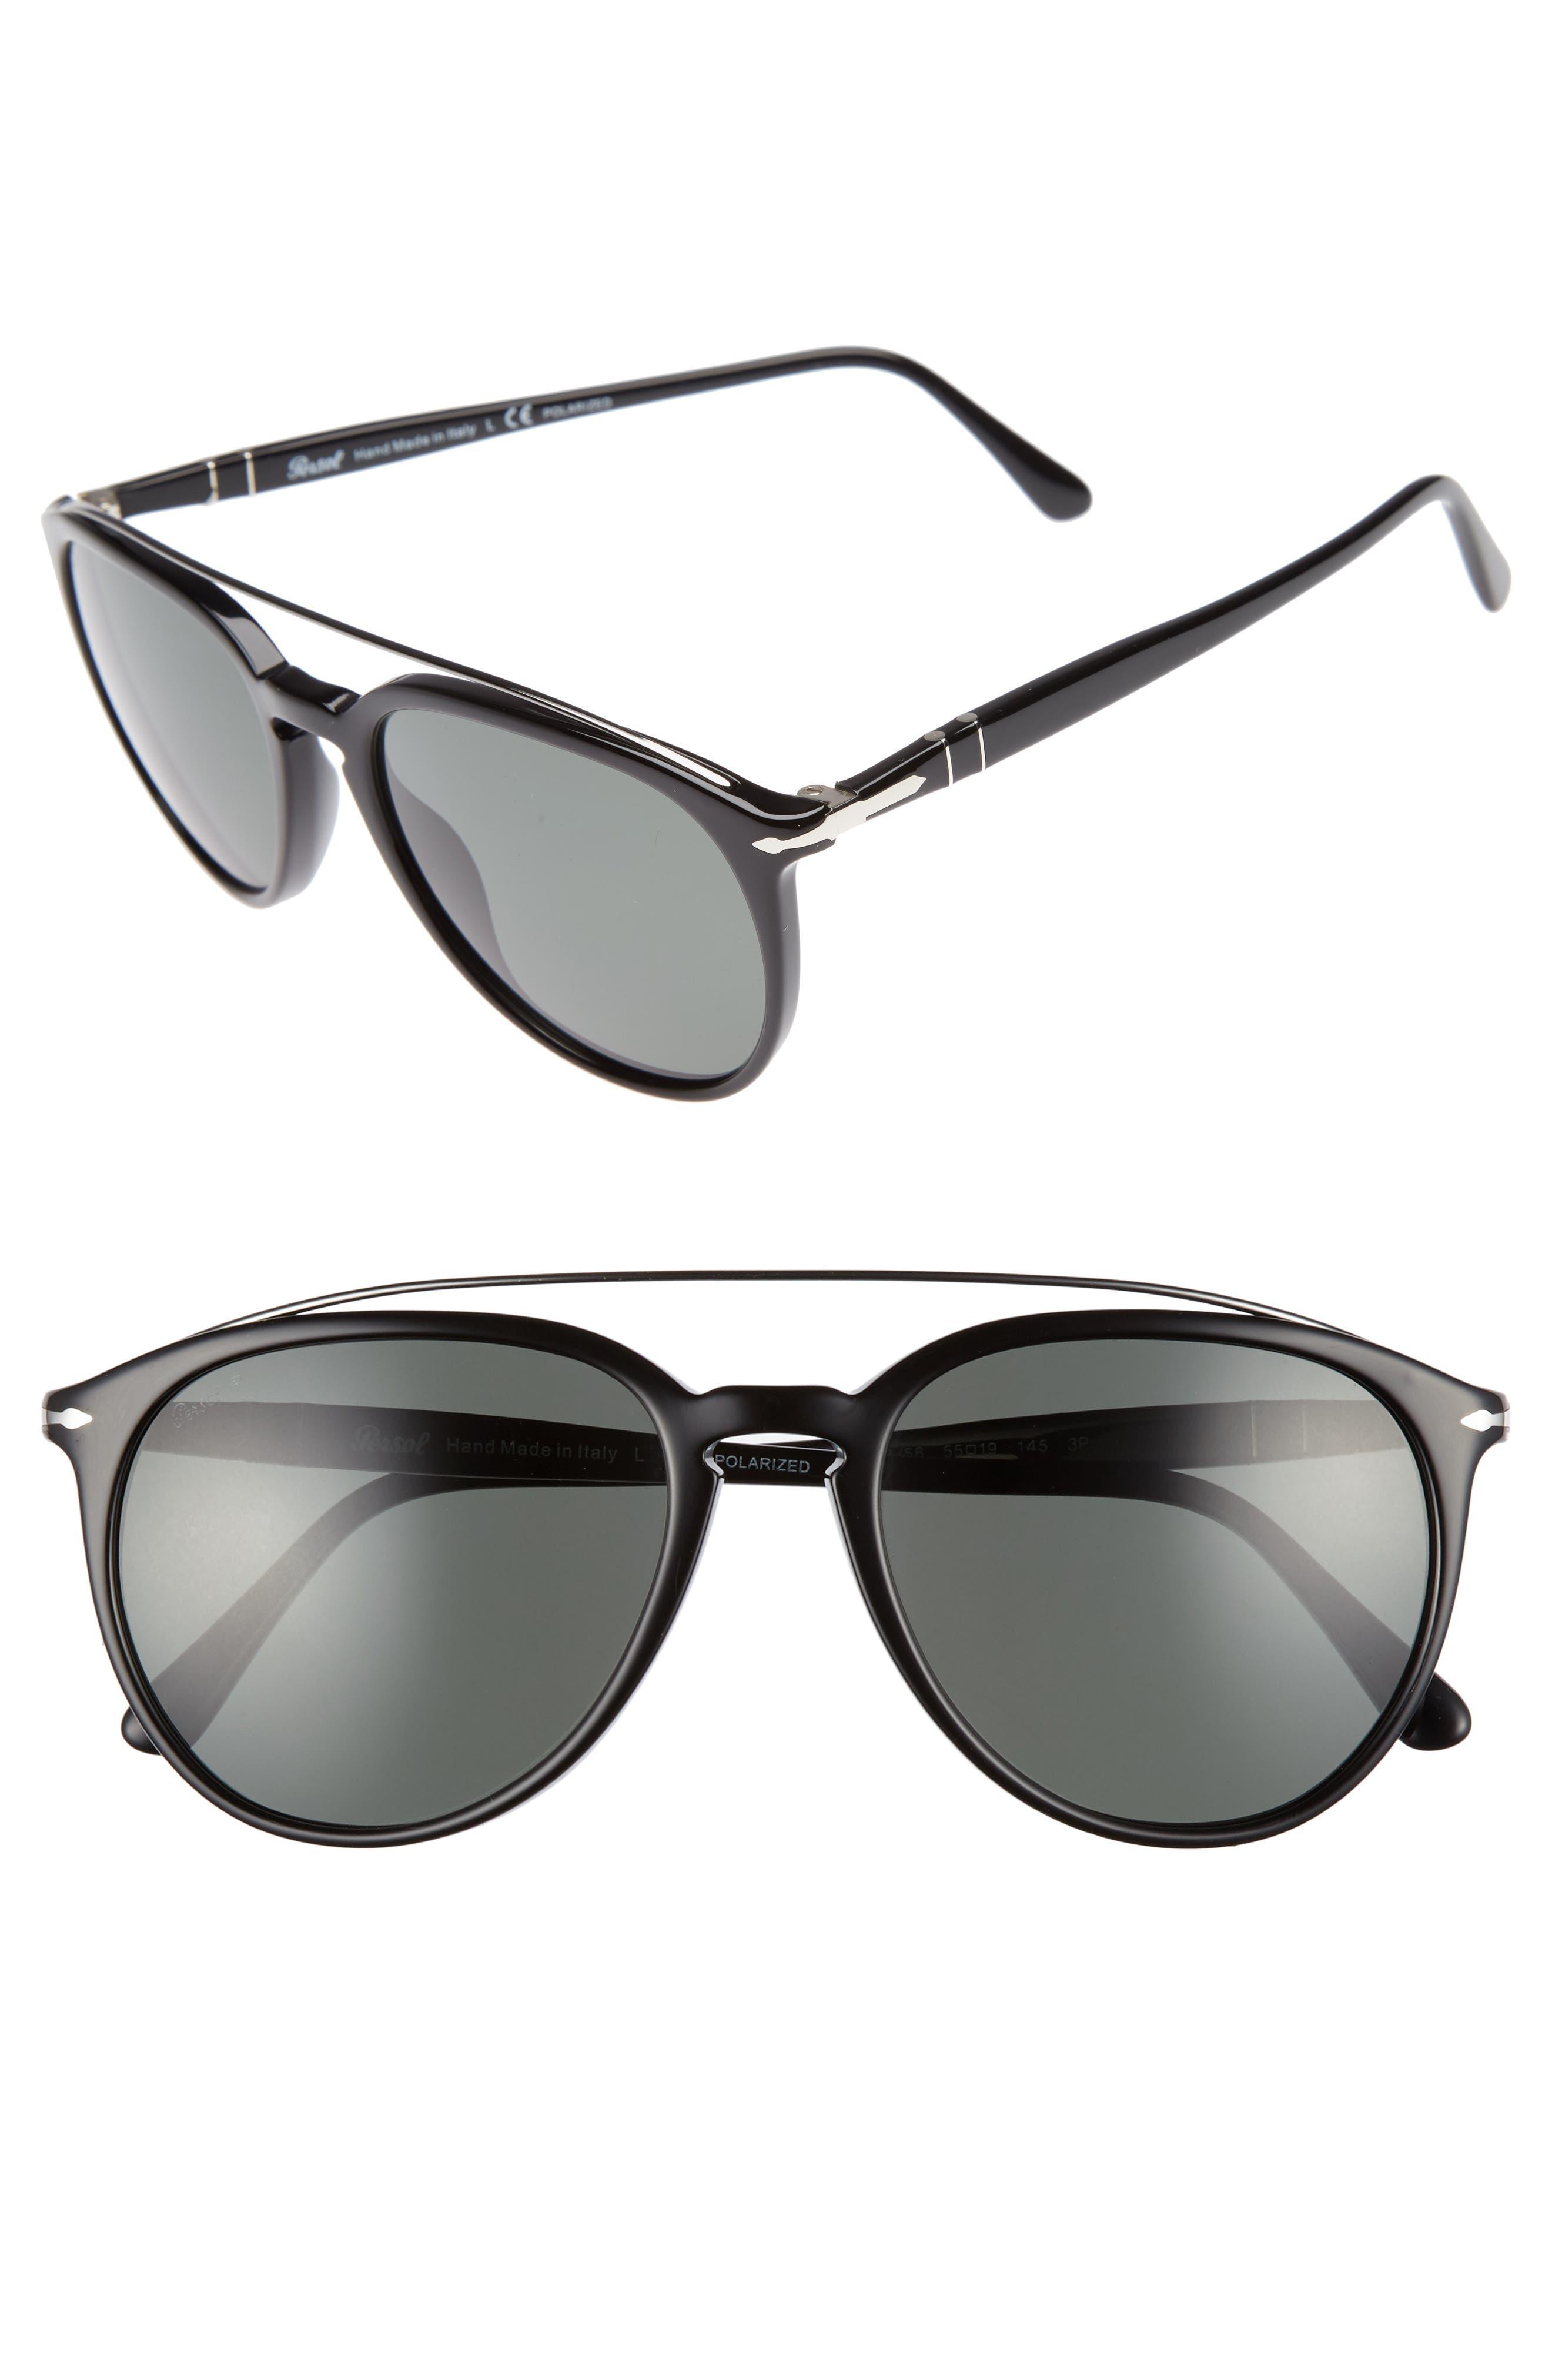 Main Image - Persol Sartoria 55mm Polarized Sunglasses